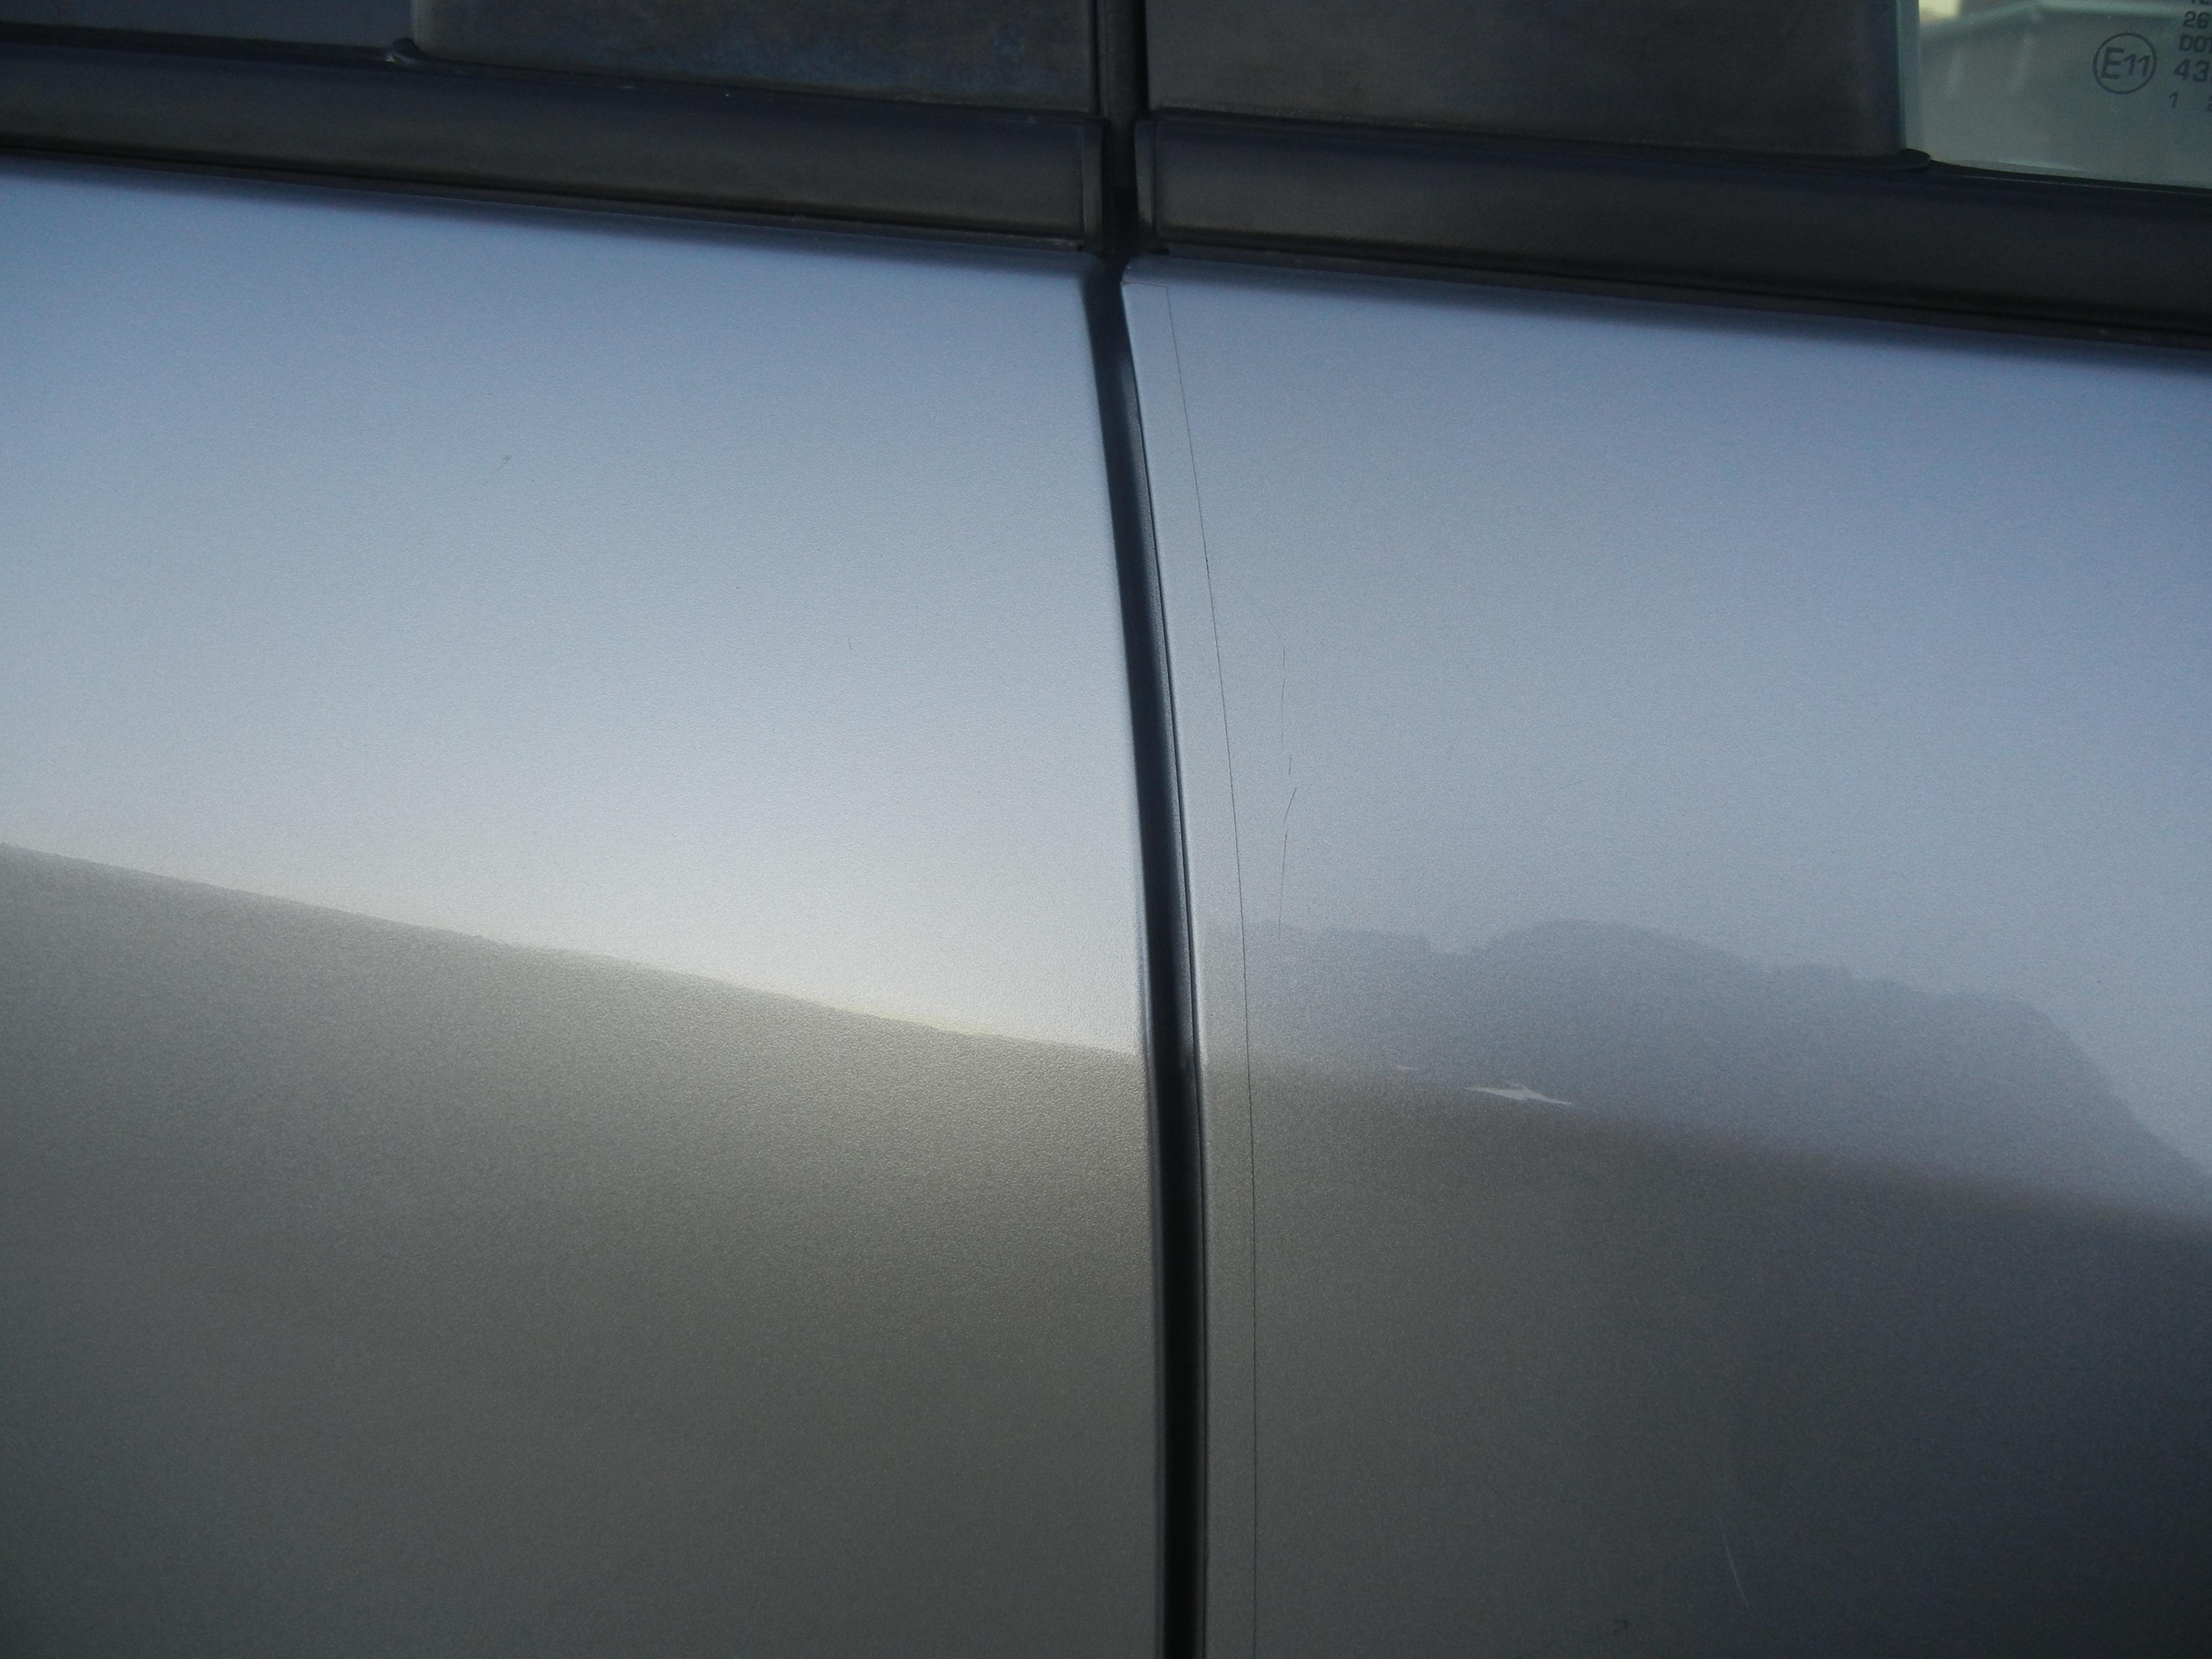 ....Invisible Door Edge Guards....